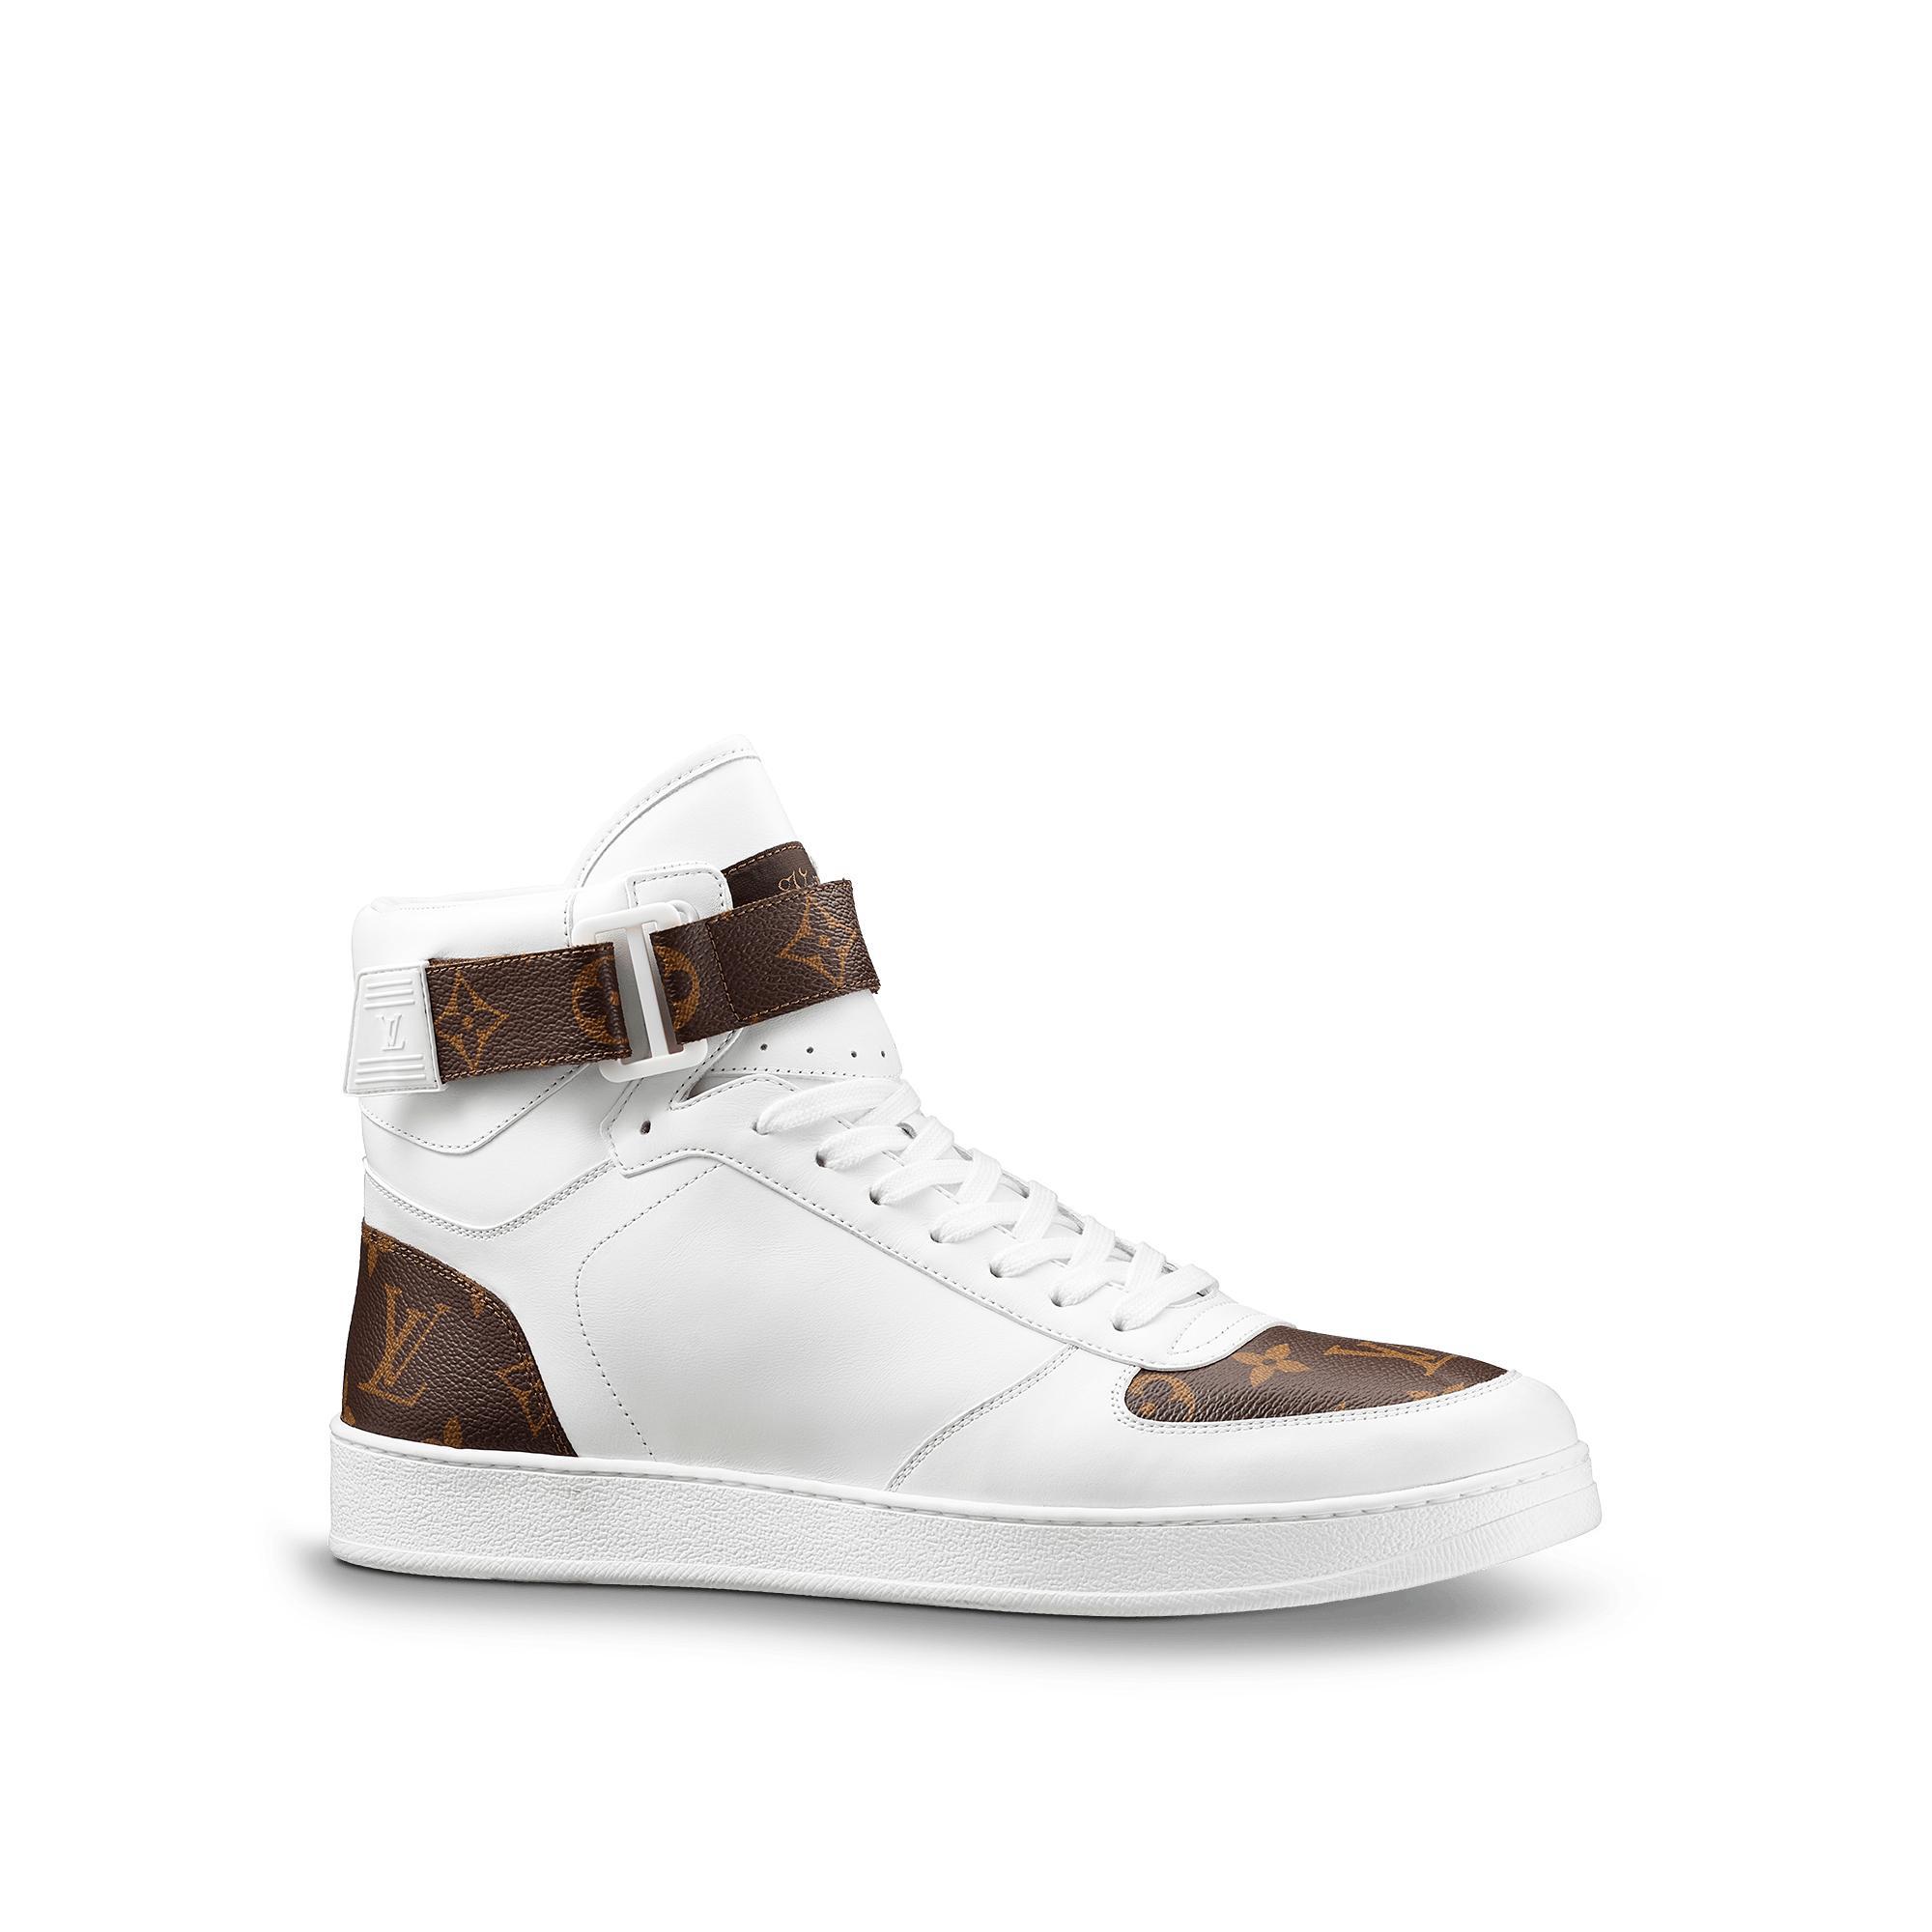 a41ab7f49e98 Louis Vuitton Rivoli Sneaker Boot